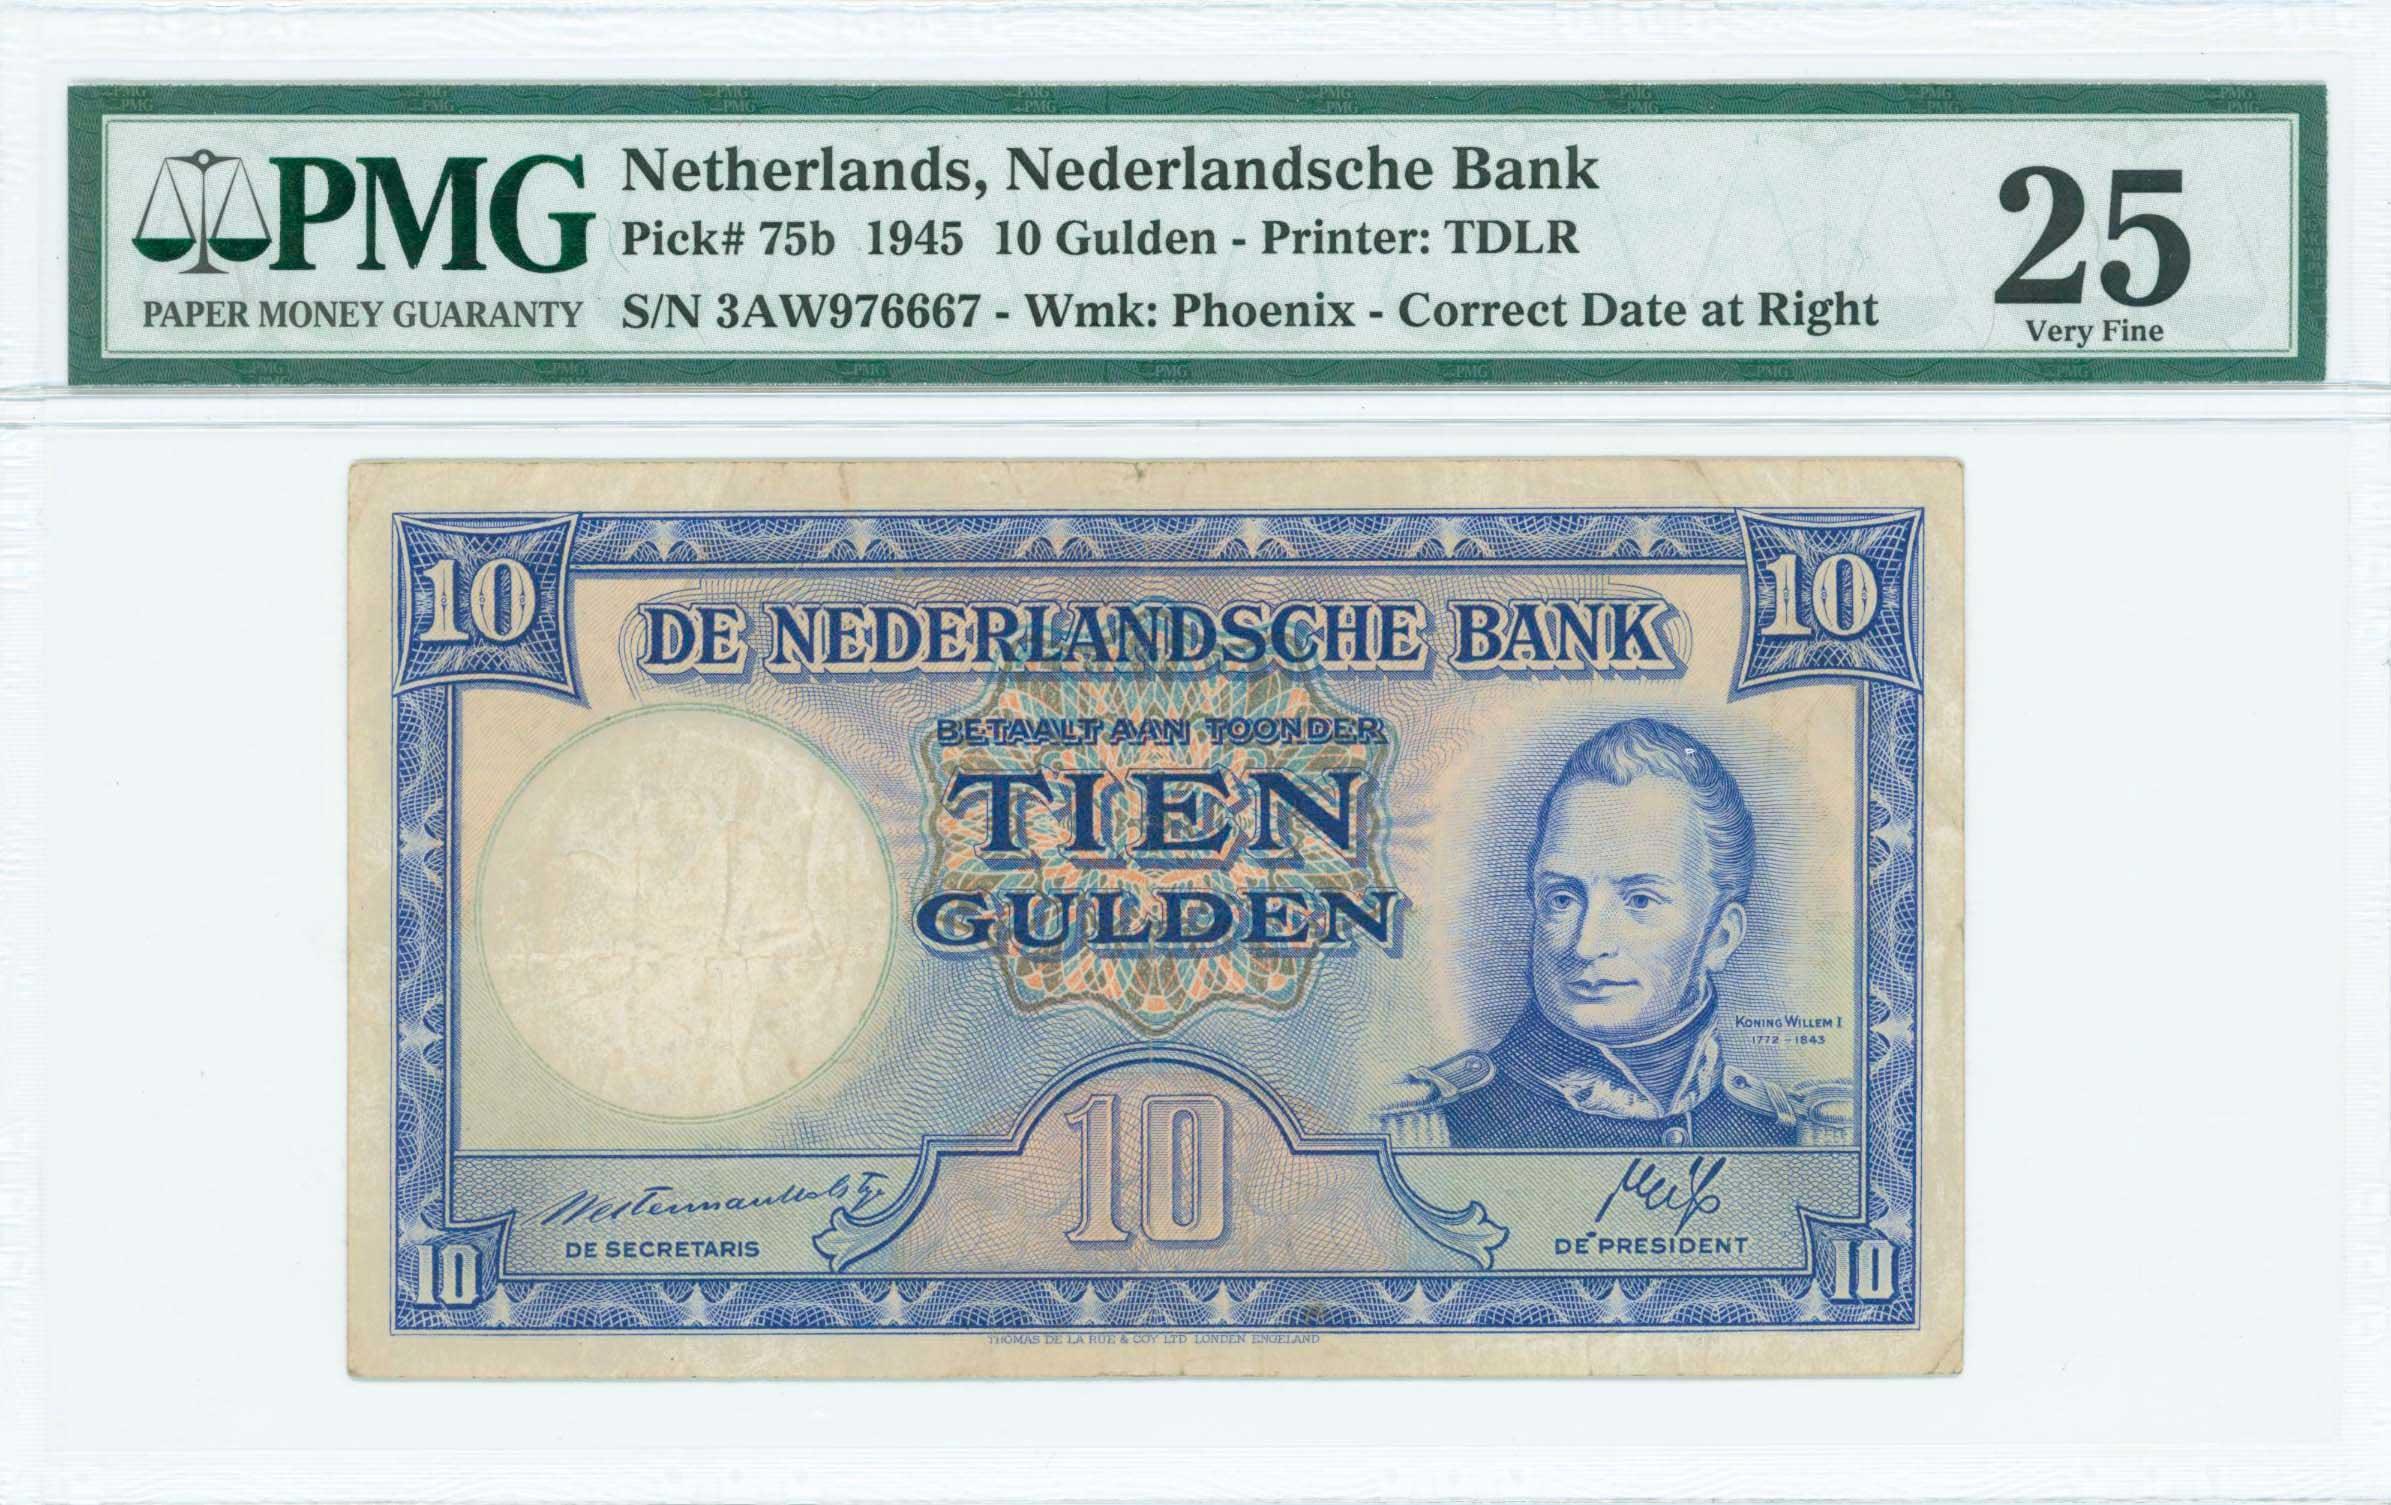 Lot 7242 - -  PAPER MONEY - BANKNOTES BANKNOTES OF EUROPEAN COUNTRIES -  A. Karamitsos Postal & Live Internet Auction 984 (Part B)